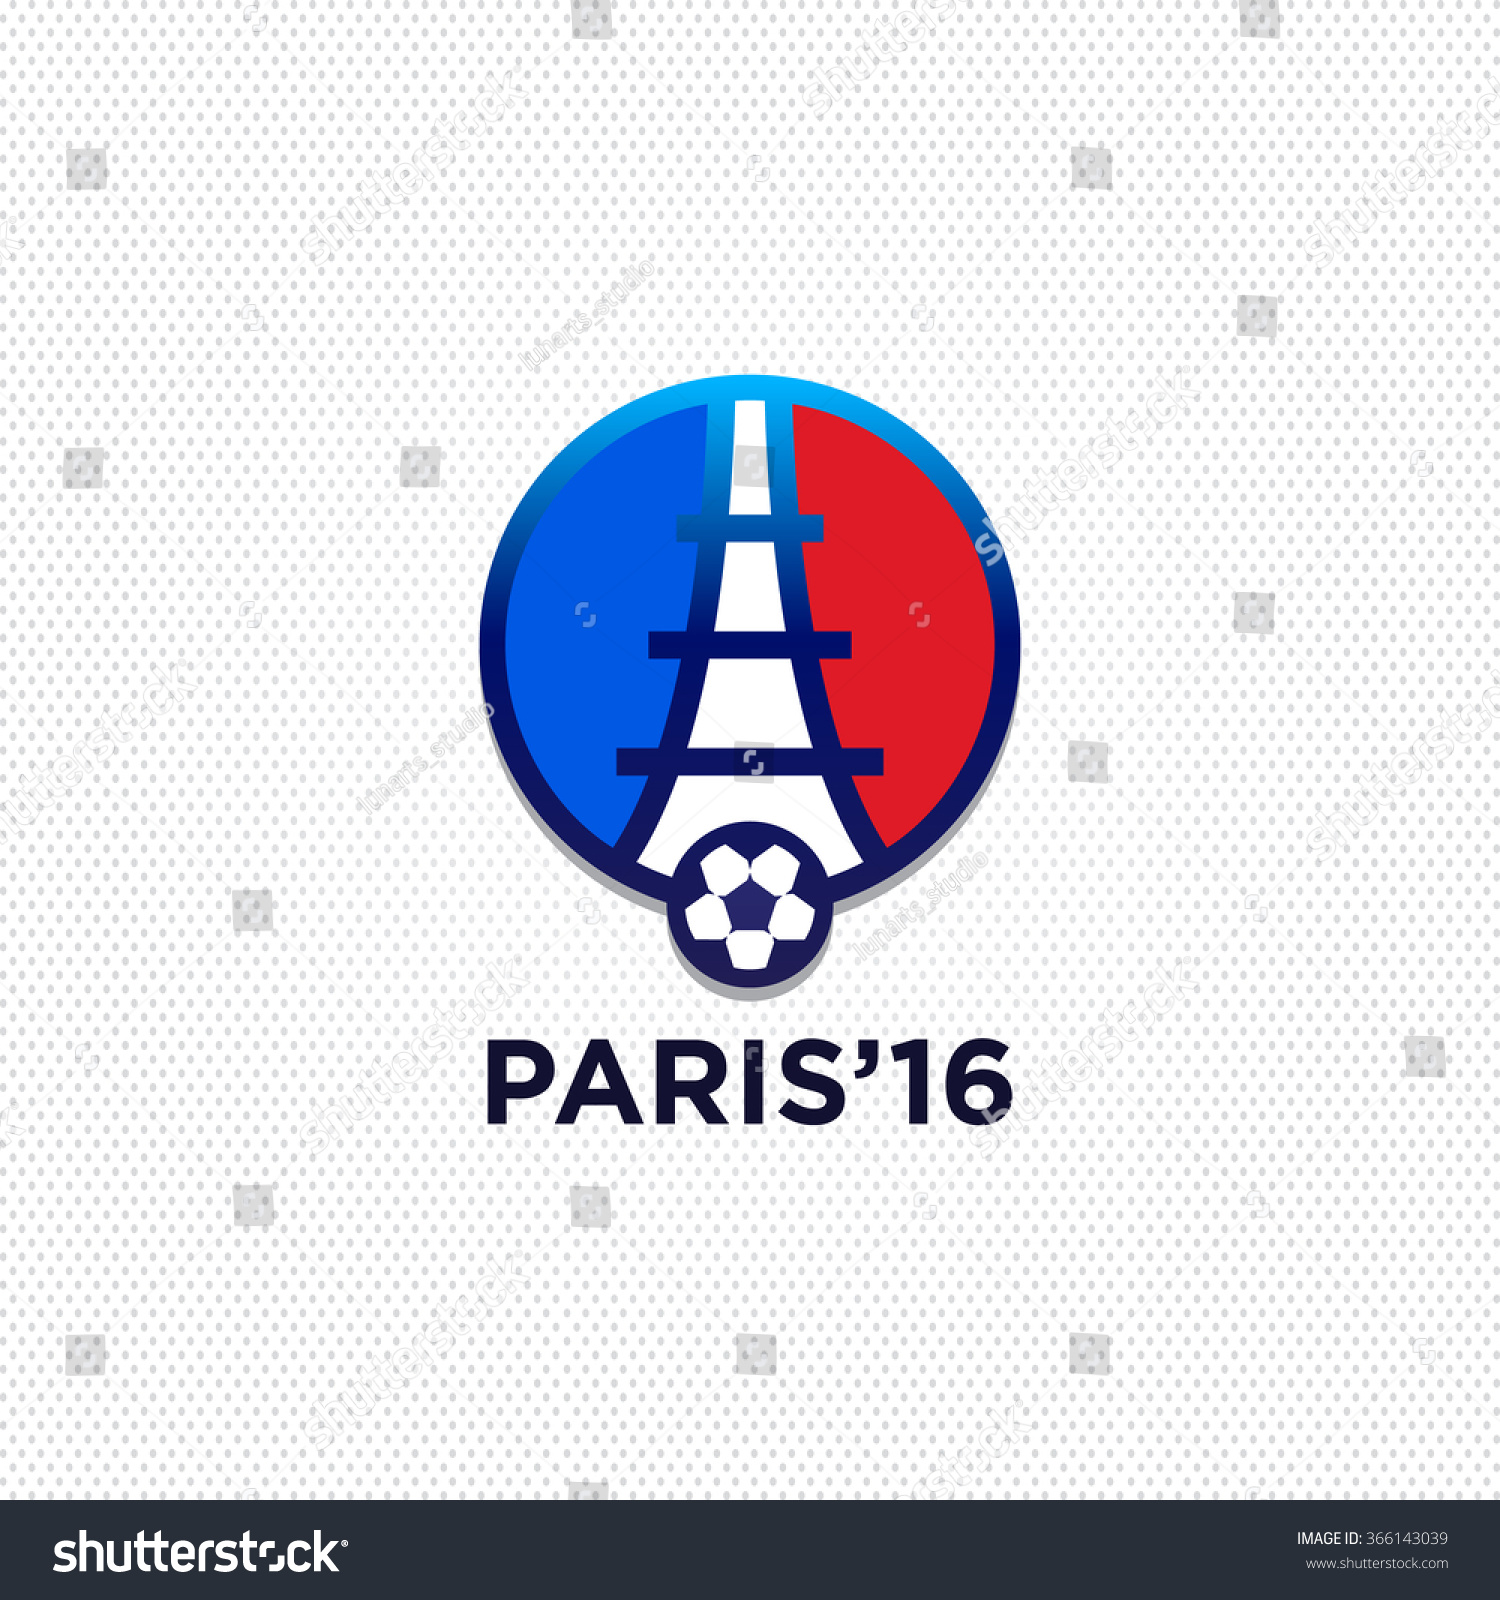 psg paris saint germain football club paris saint psg